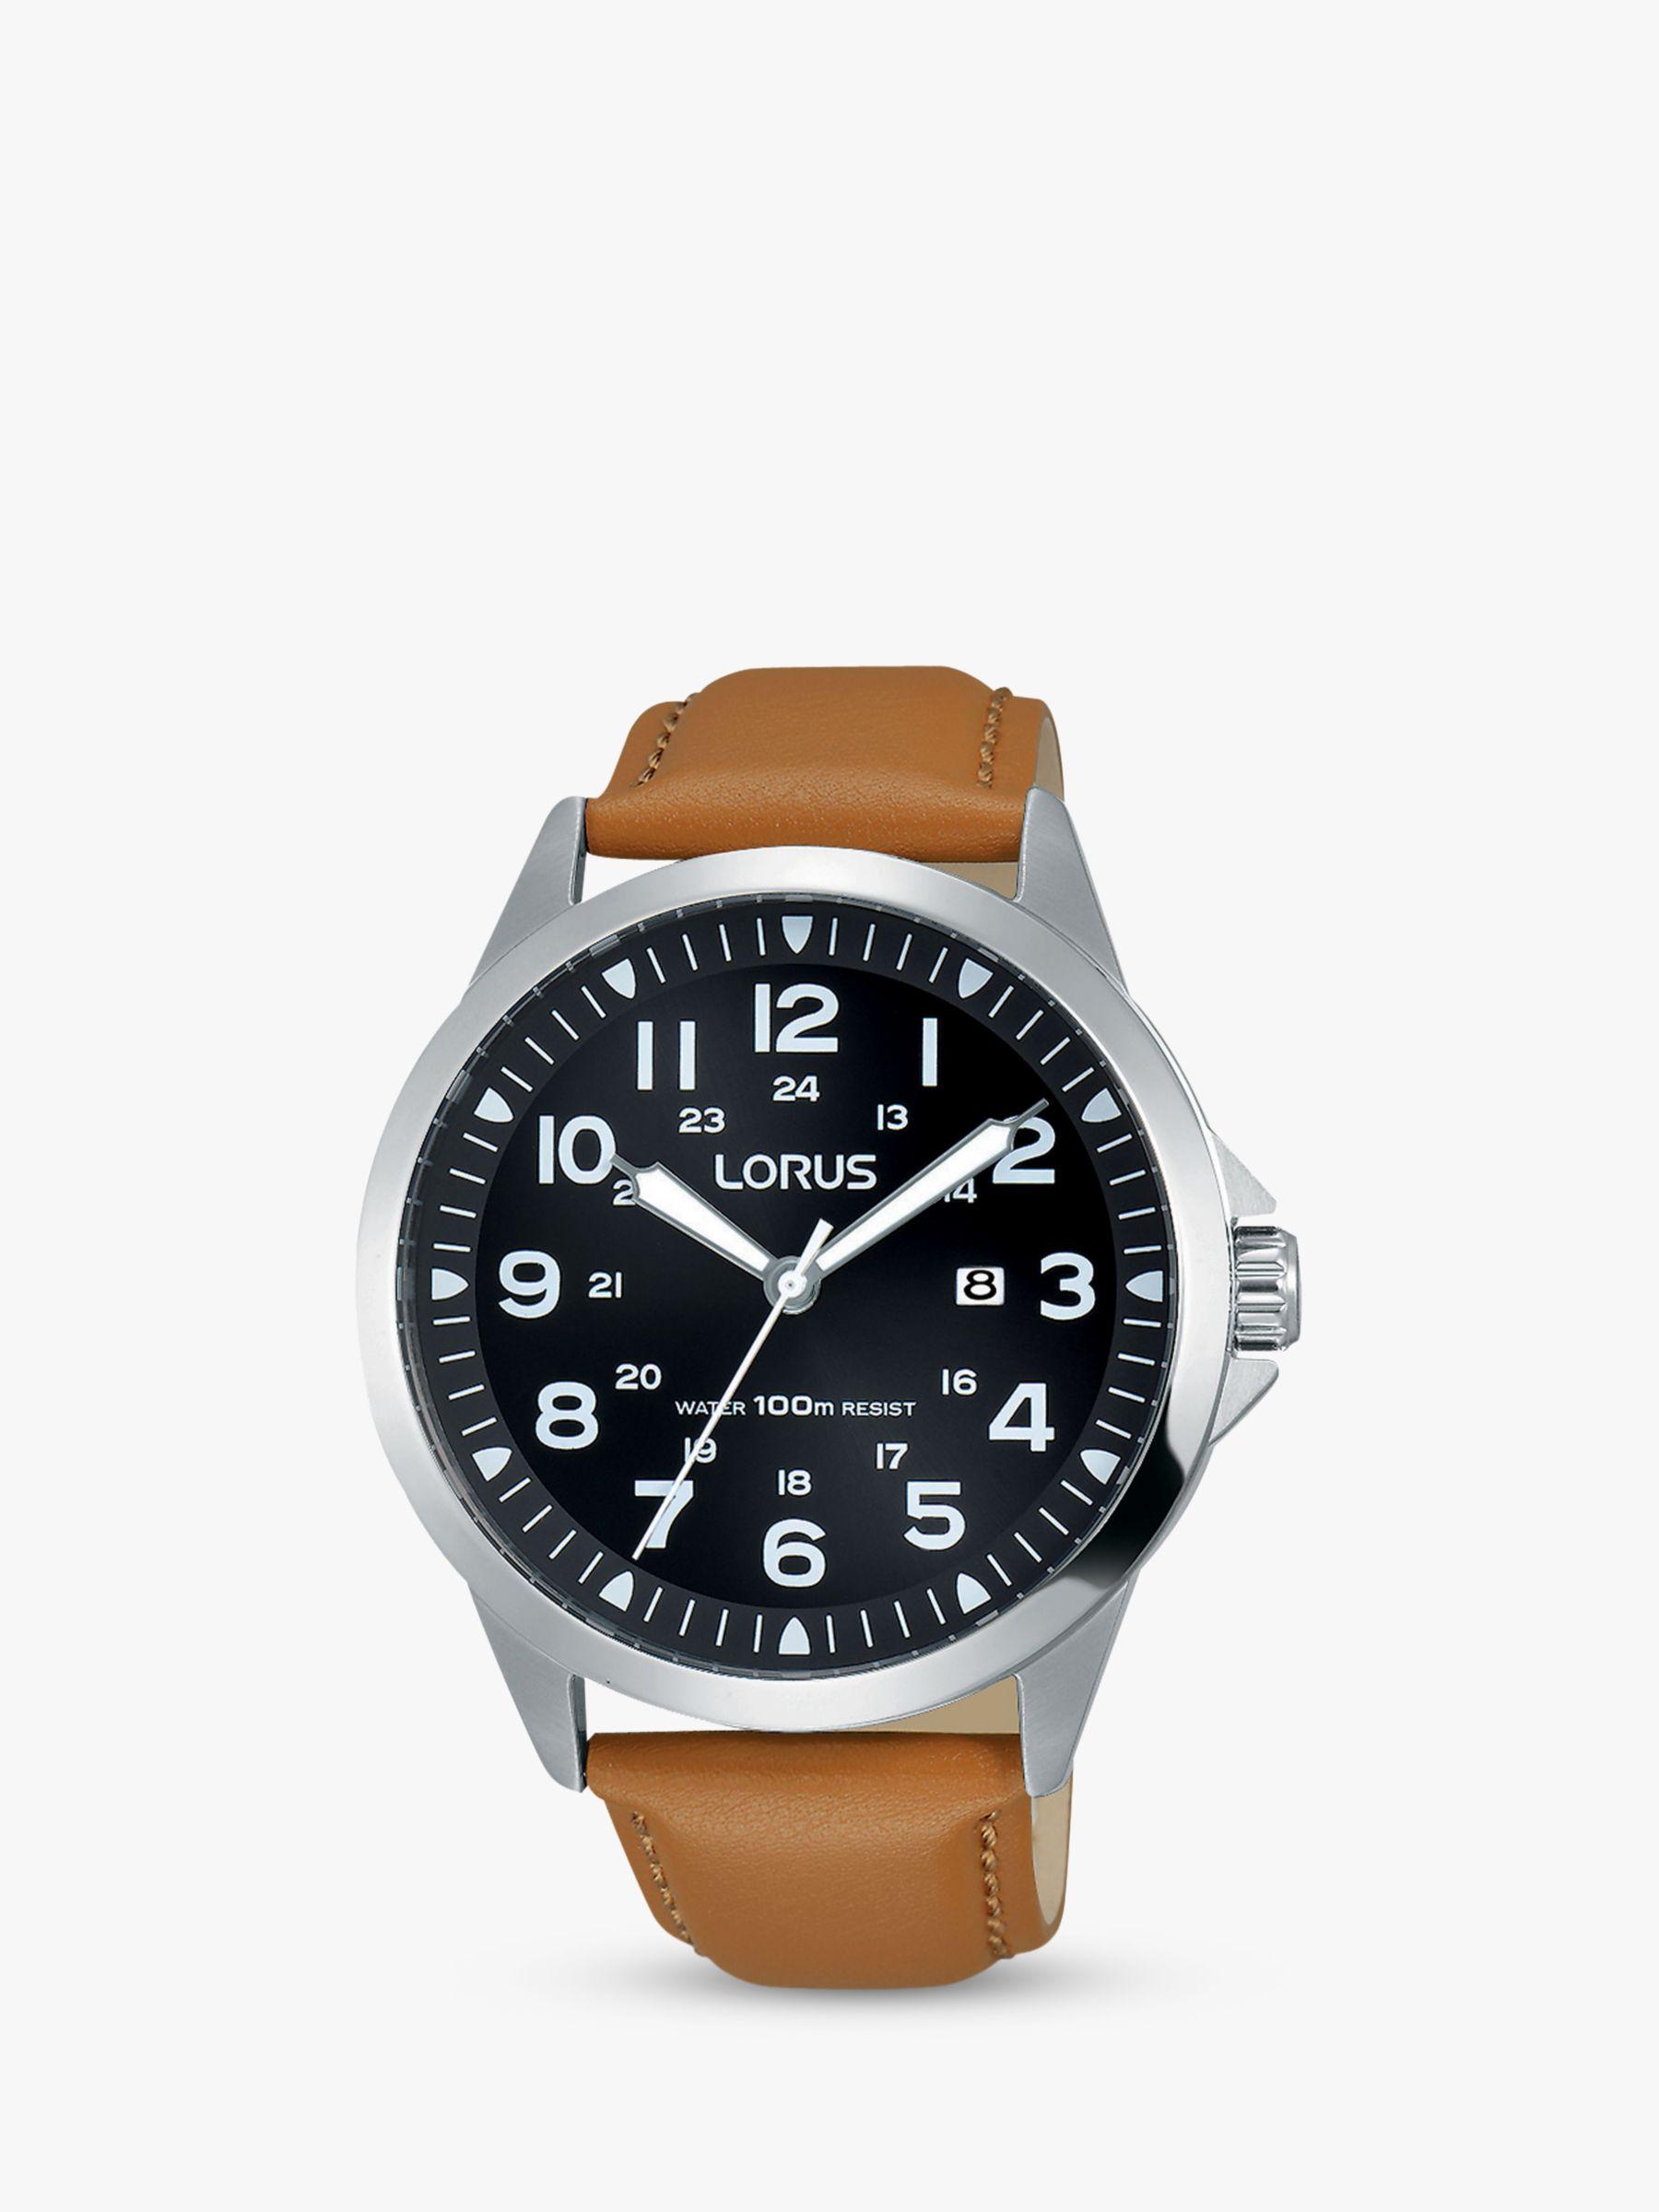 Lorus Lorus RH933GX9 Men's Date Leather Strap Watch, Camel/Black